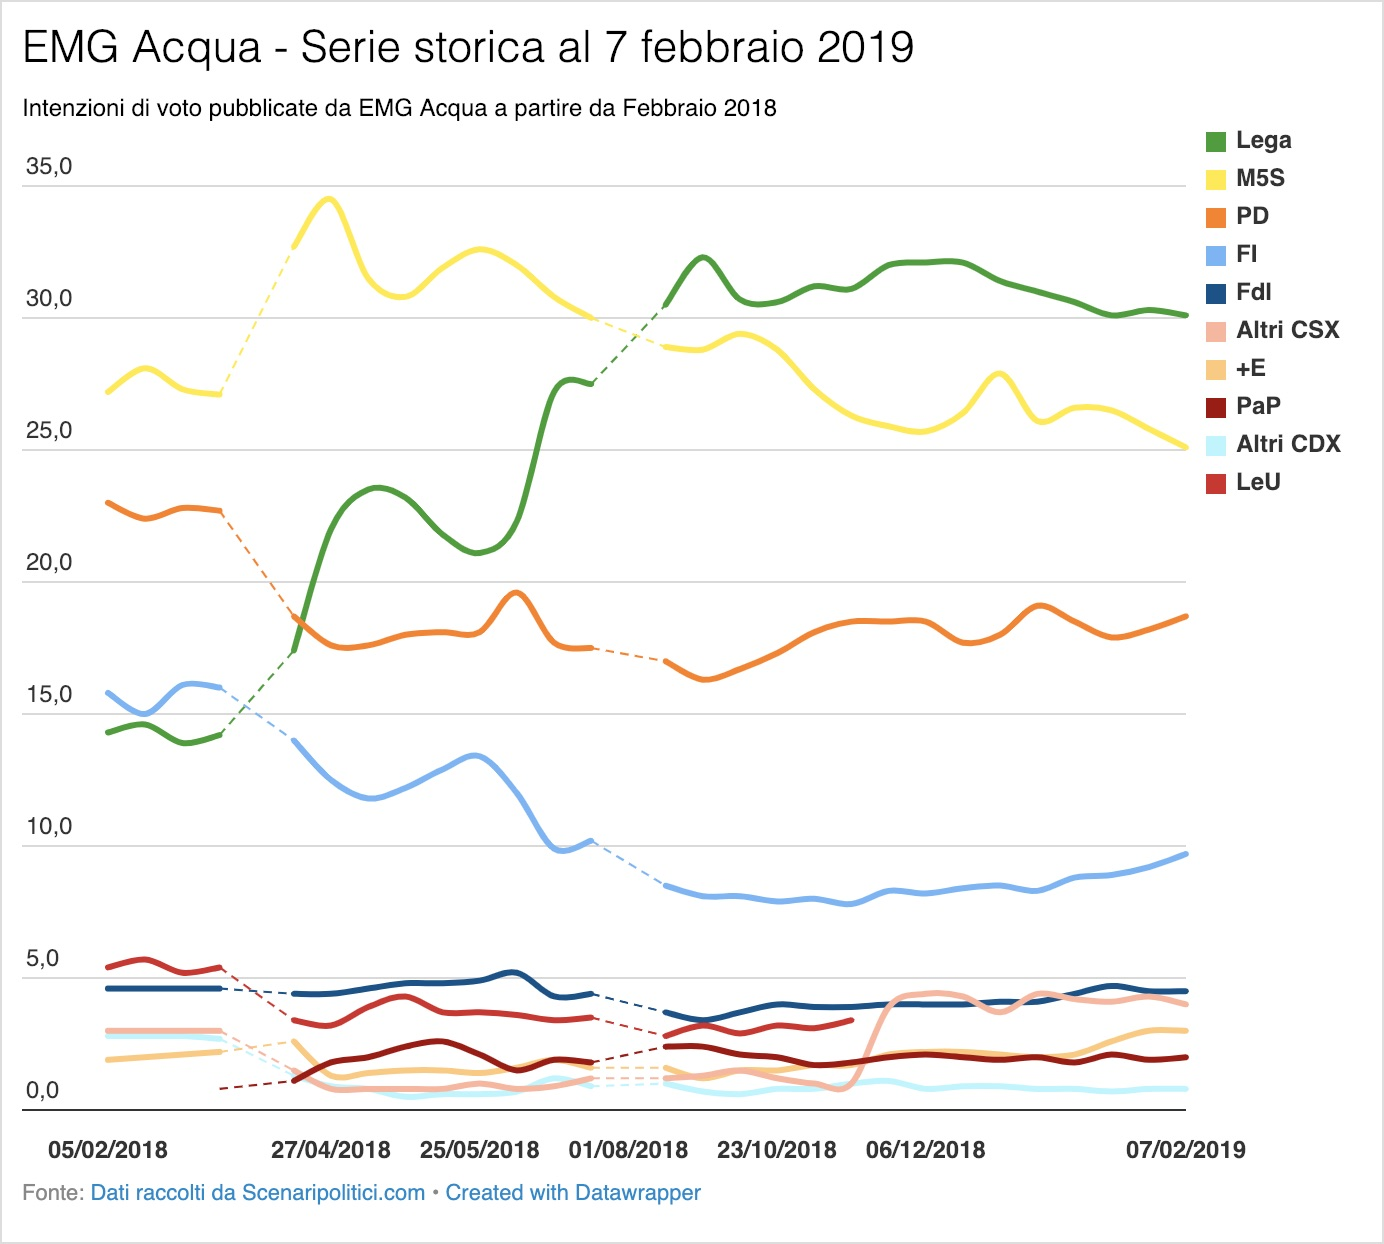 Sondaggio EMG Acqua 7 febbraio 2019